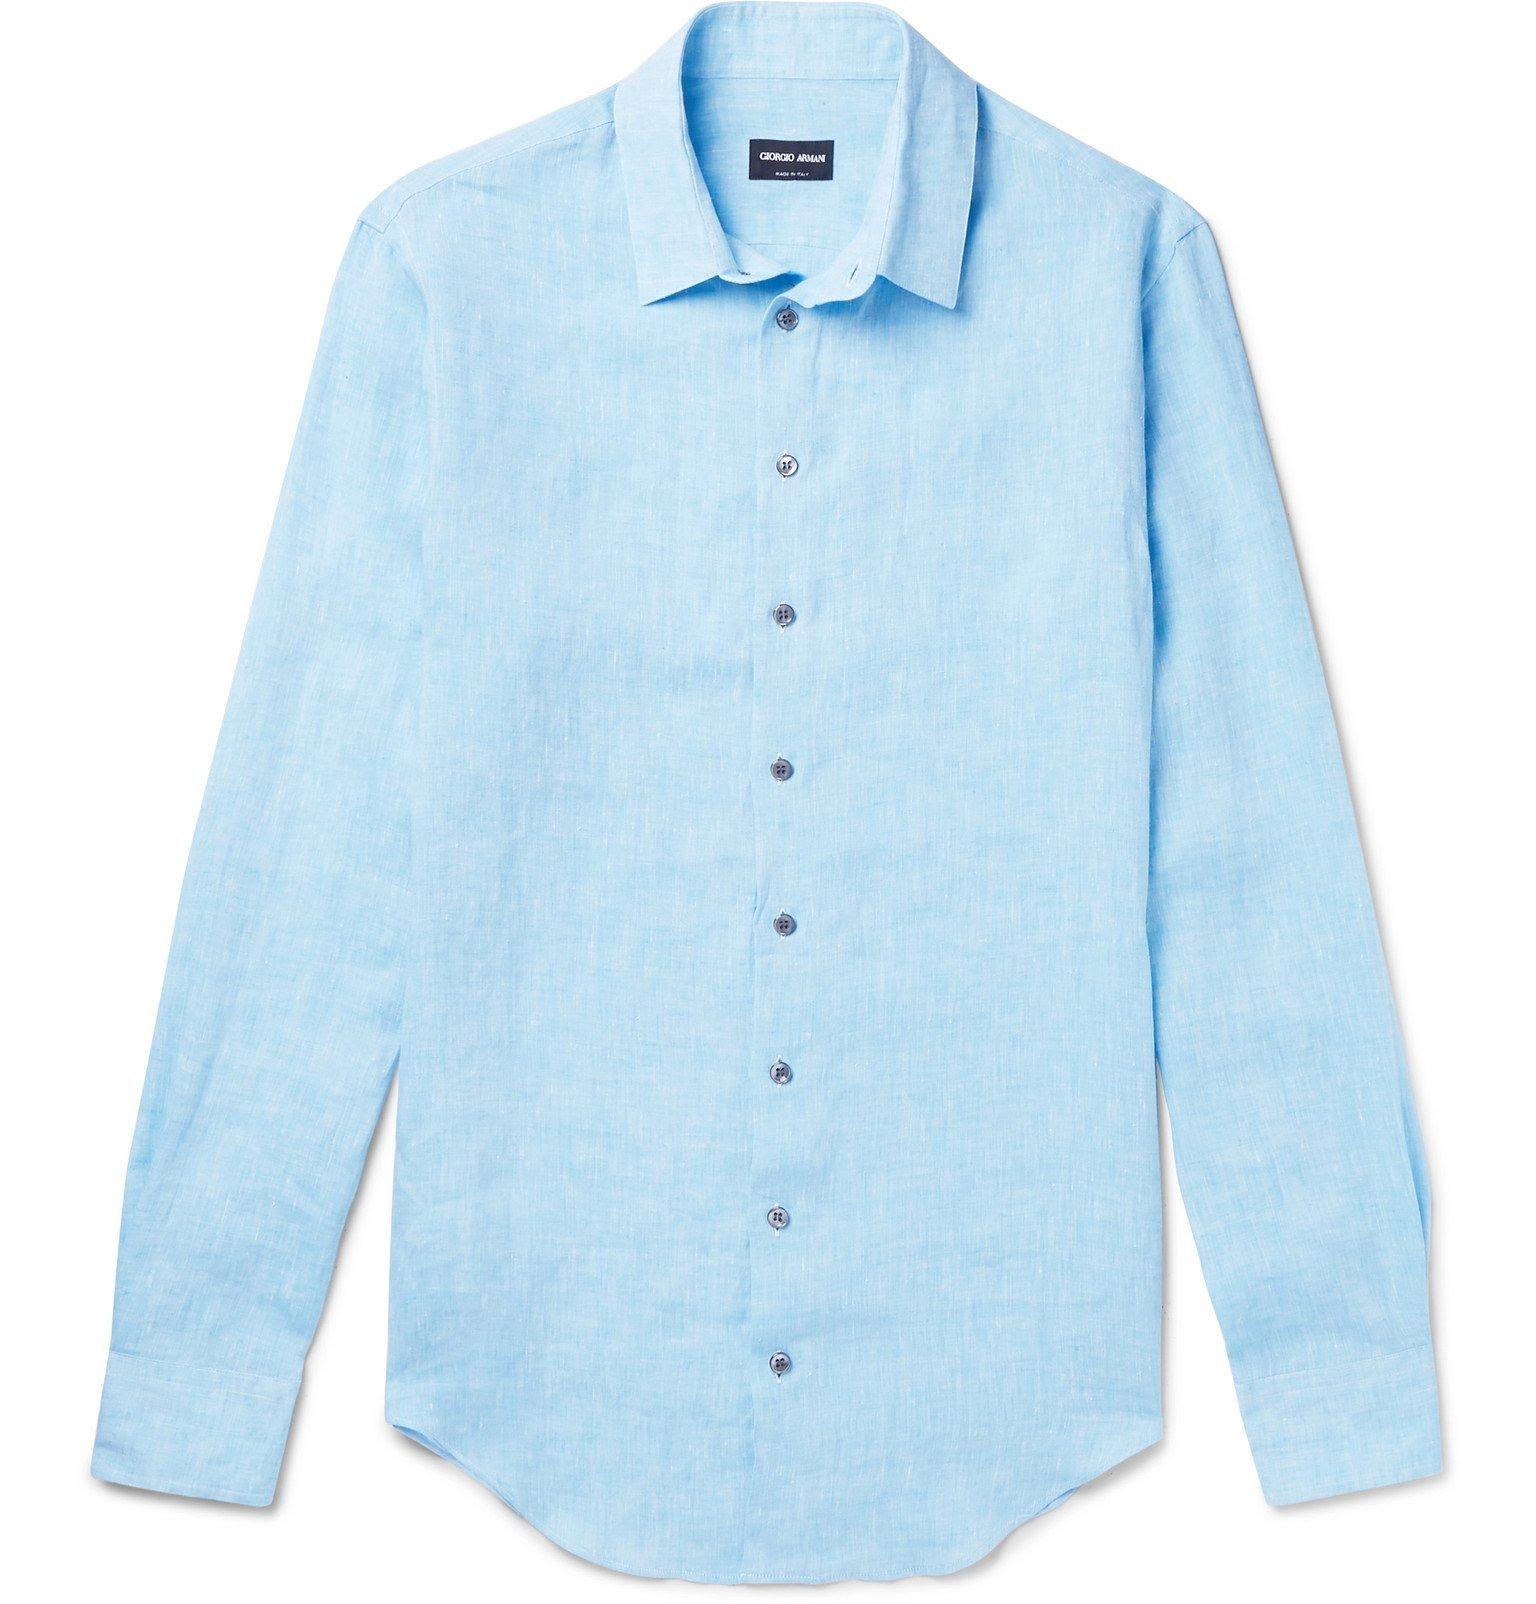 Giorgio Armani - Mélange Linen Shirt - Blue